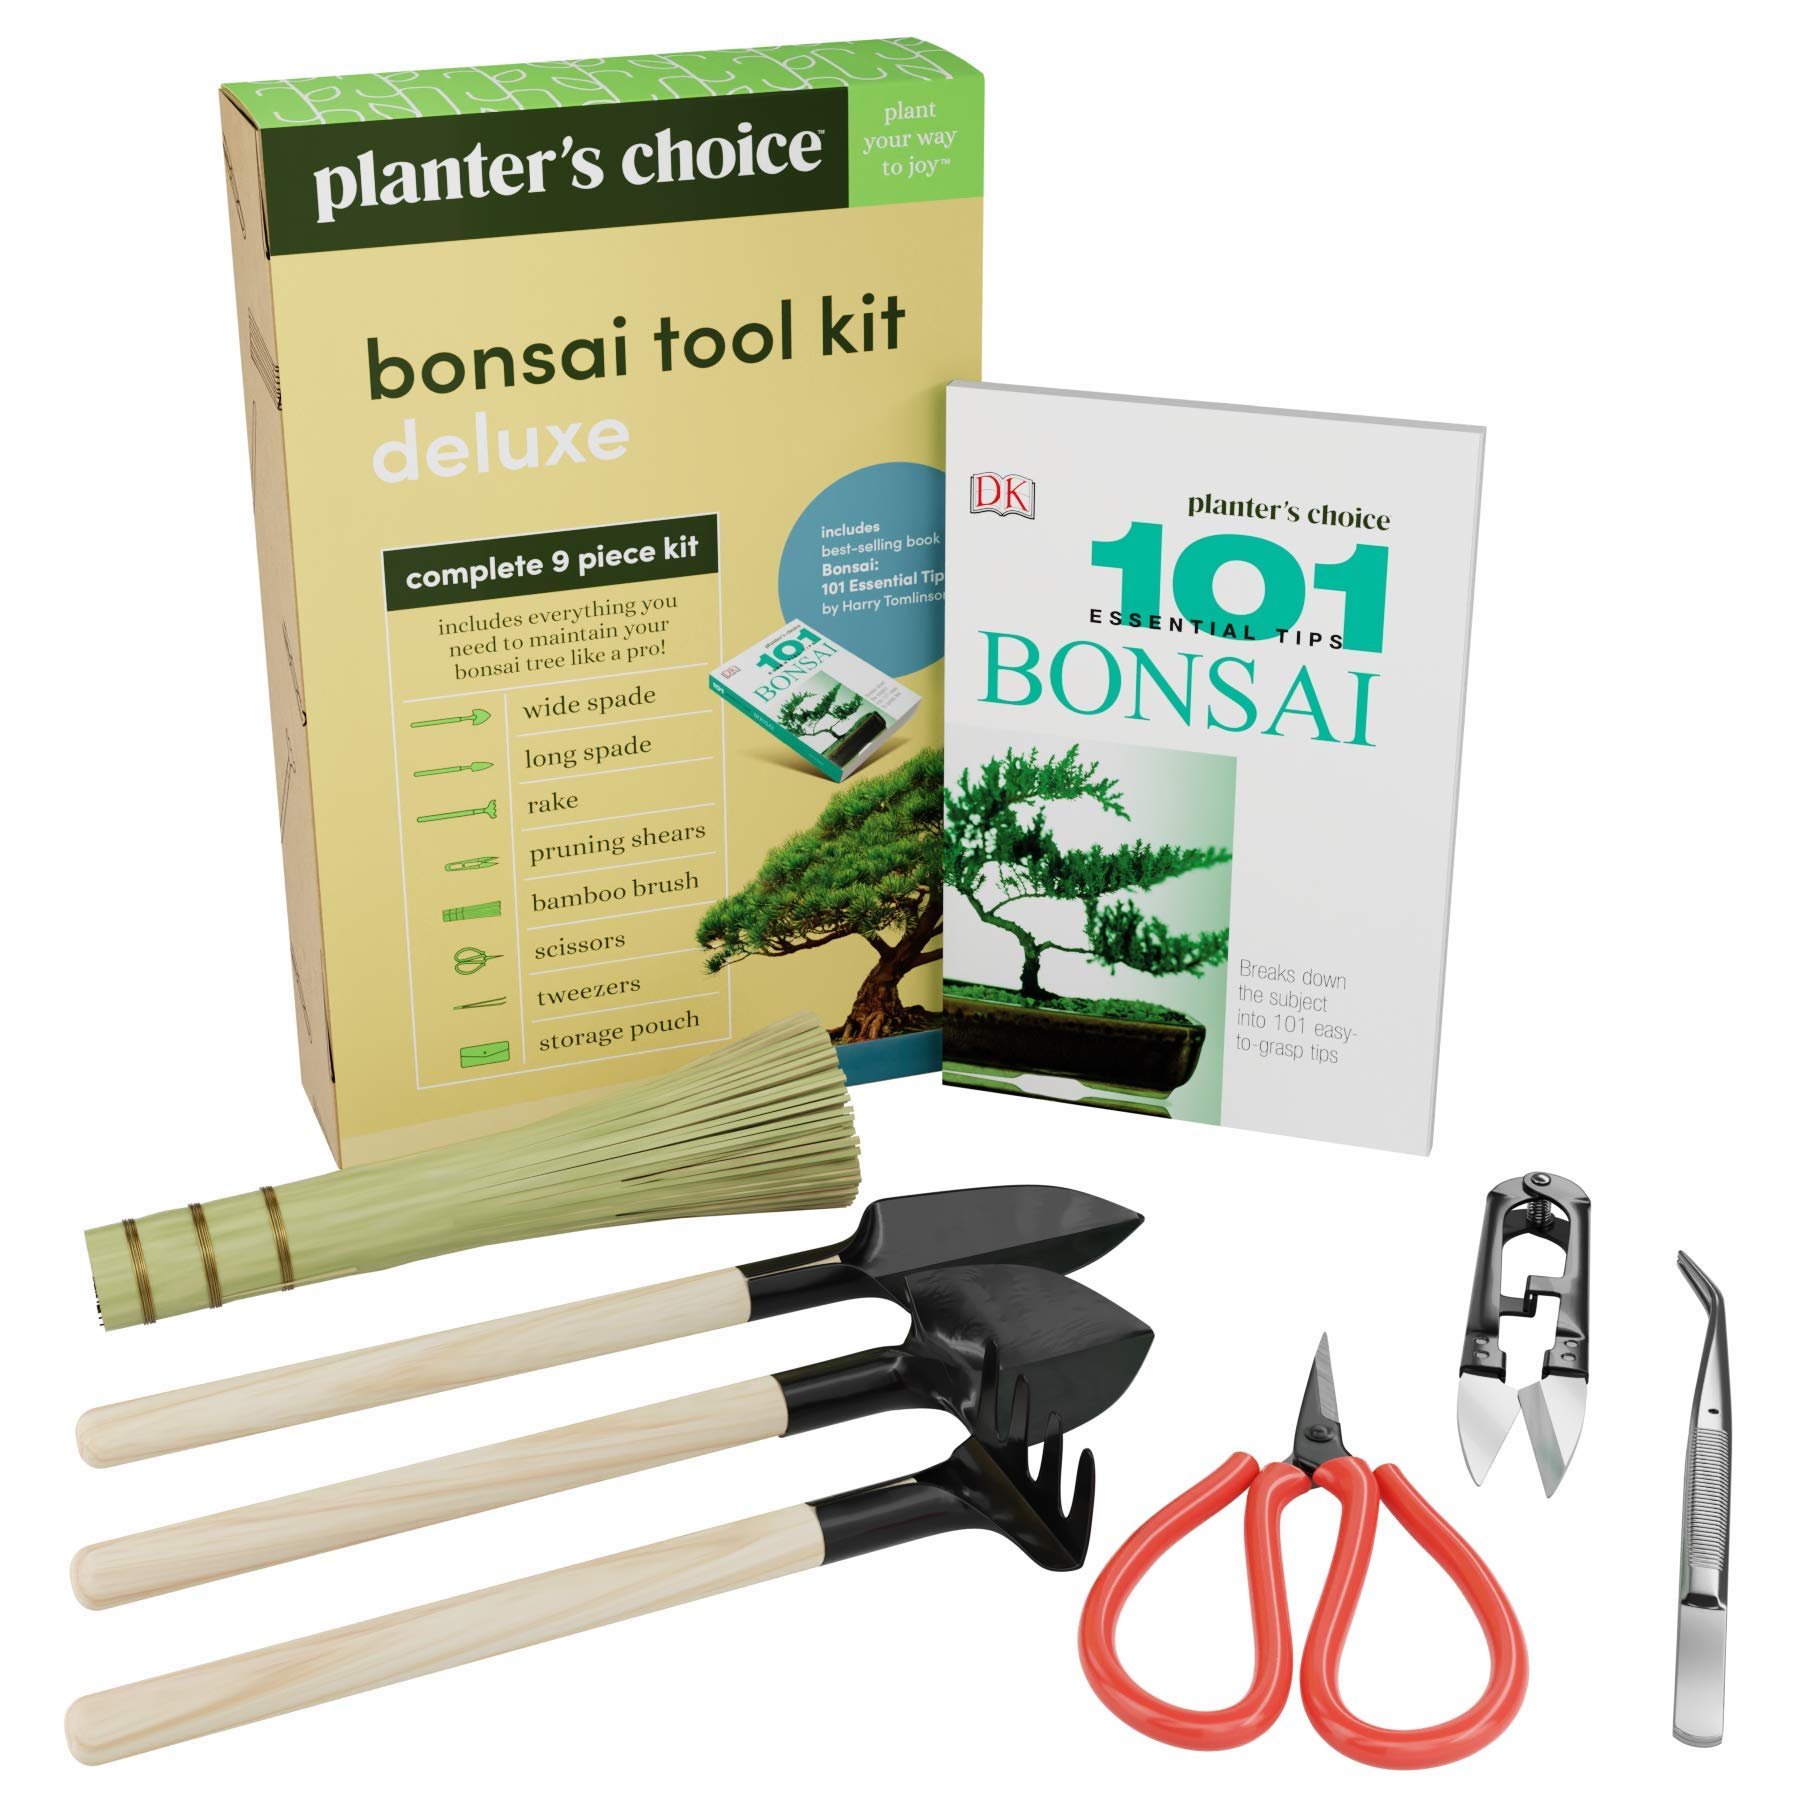 Premium Bonsai Tool Kit + Bonsai 101 Book - Set Includes: Wooden Rake, Long & Wide Spades, Scissors, Tweezers, Bamboo Brush, & Pruning Shears (Trimmer/Clipper) in Fabric Storage Holder - Bonsai Tools